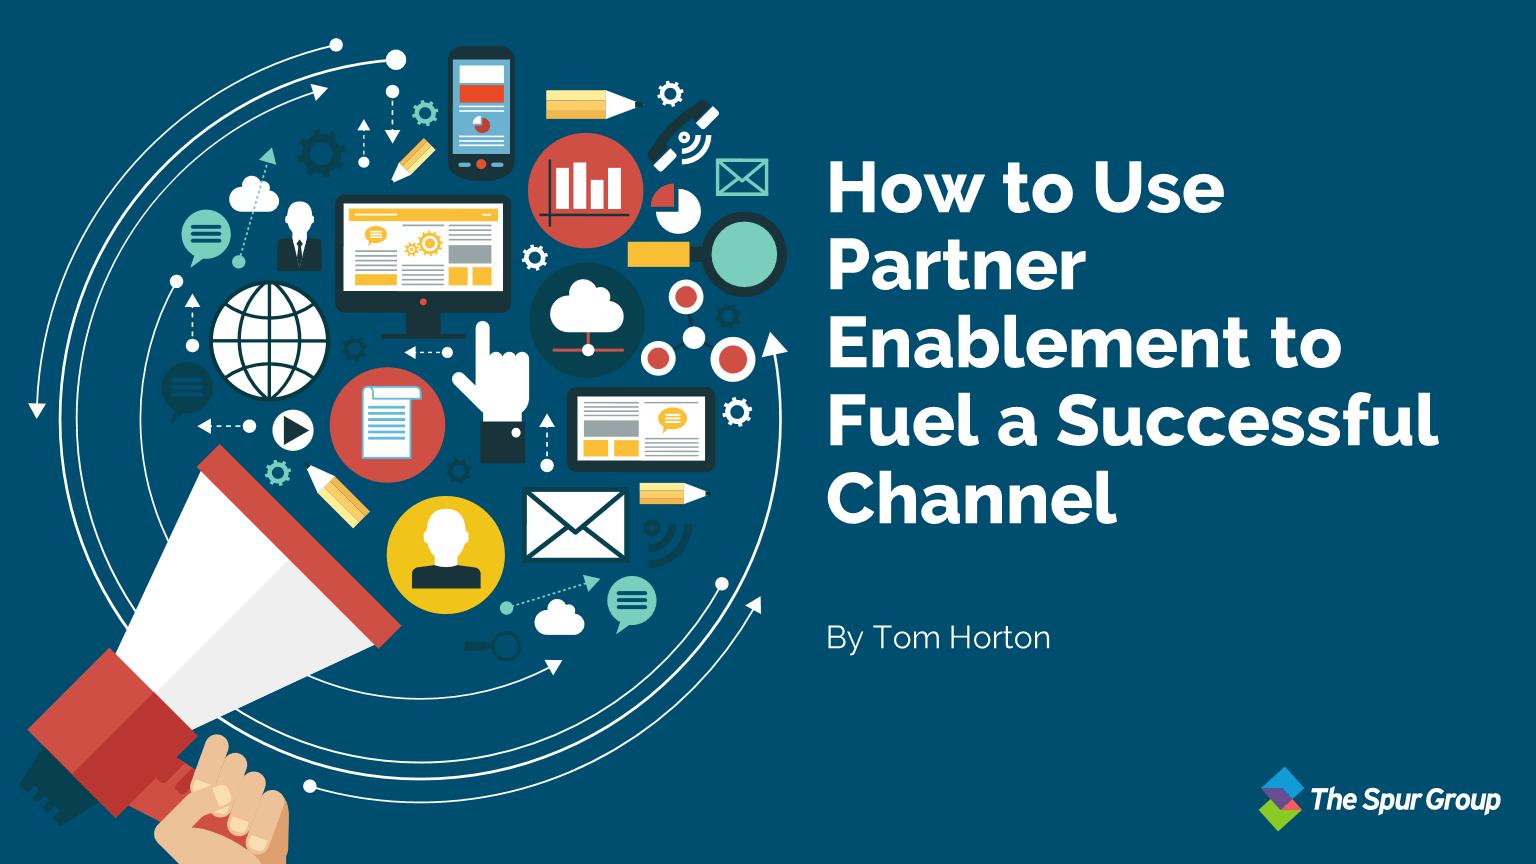 How ToUse Partner EnablementToFuelA SuccessfulChannel Featured Image